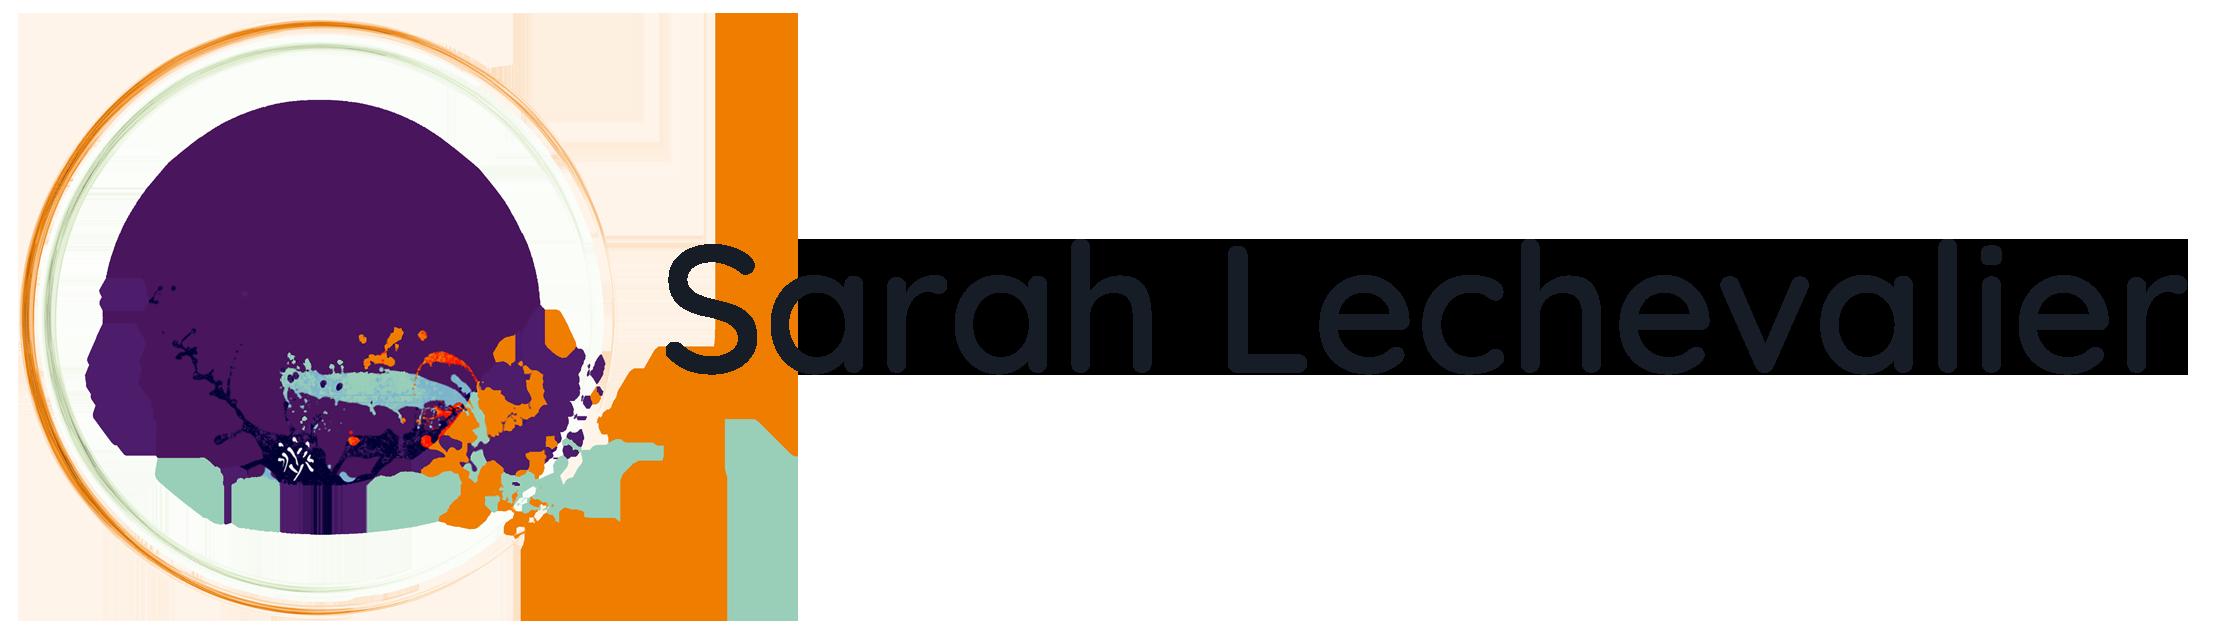 Sarah Lechevalier